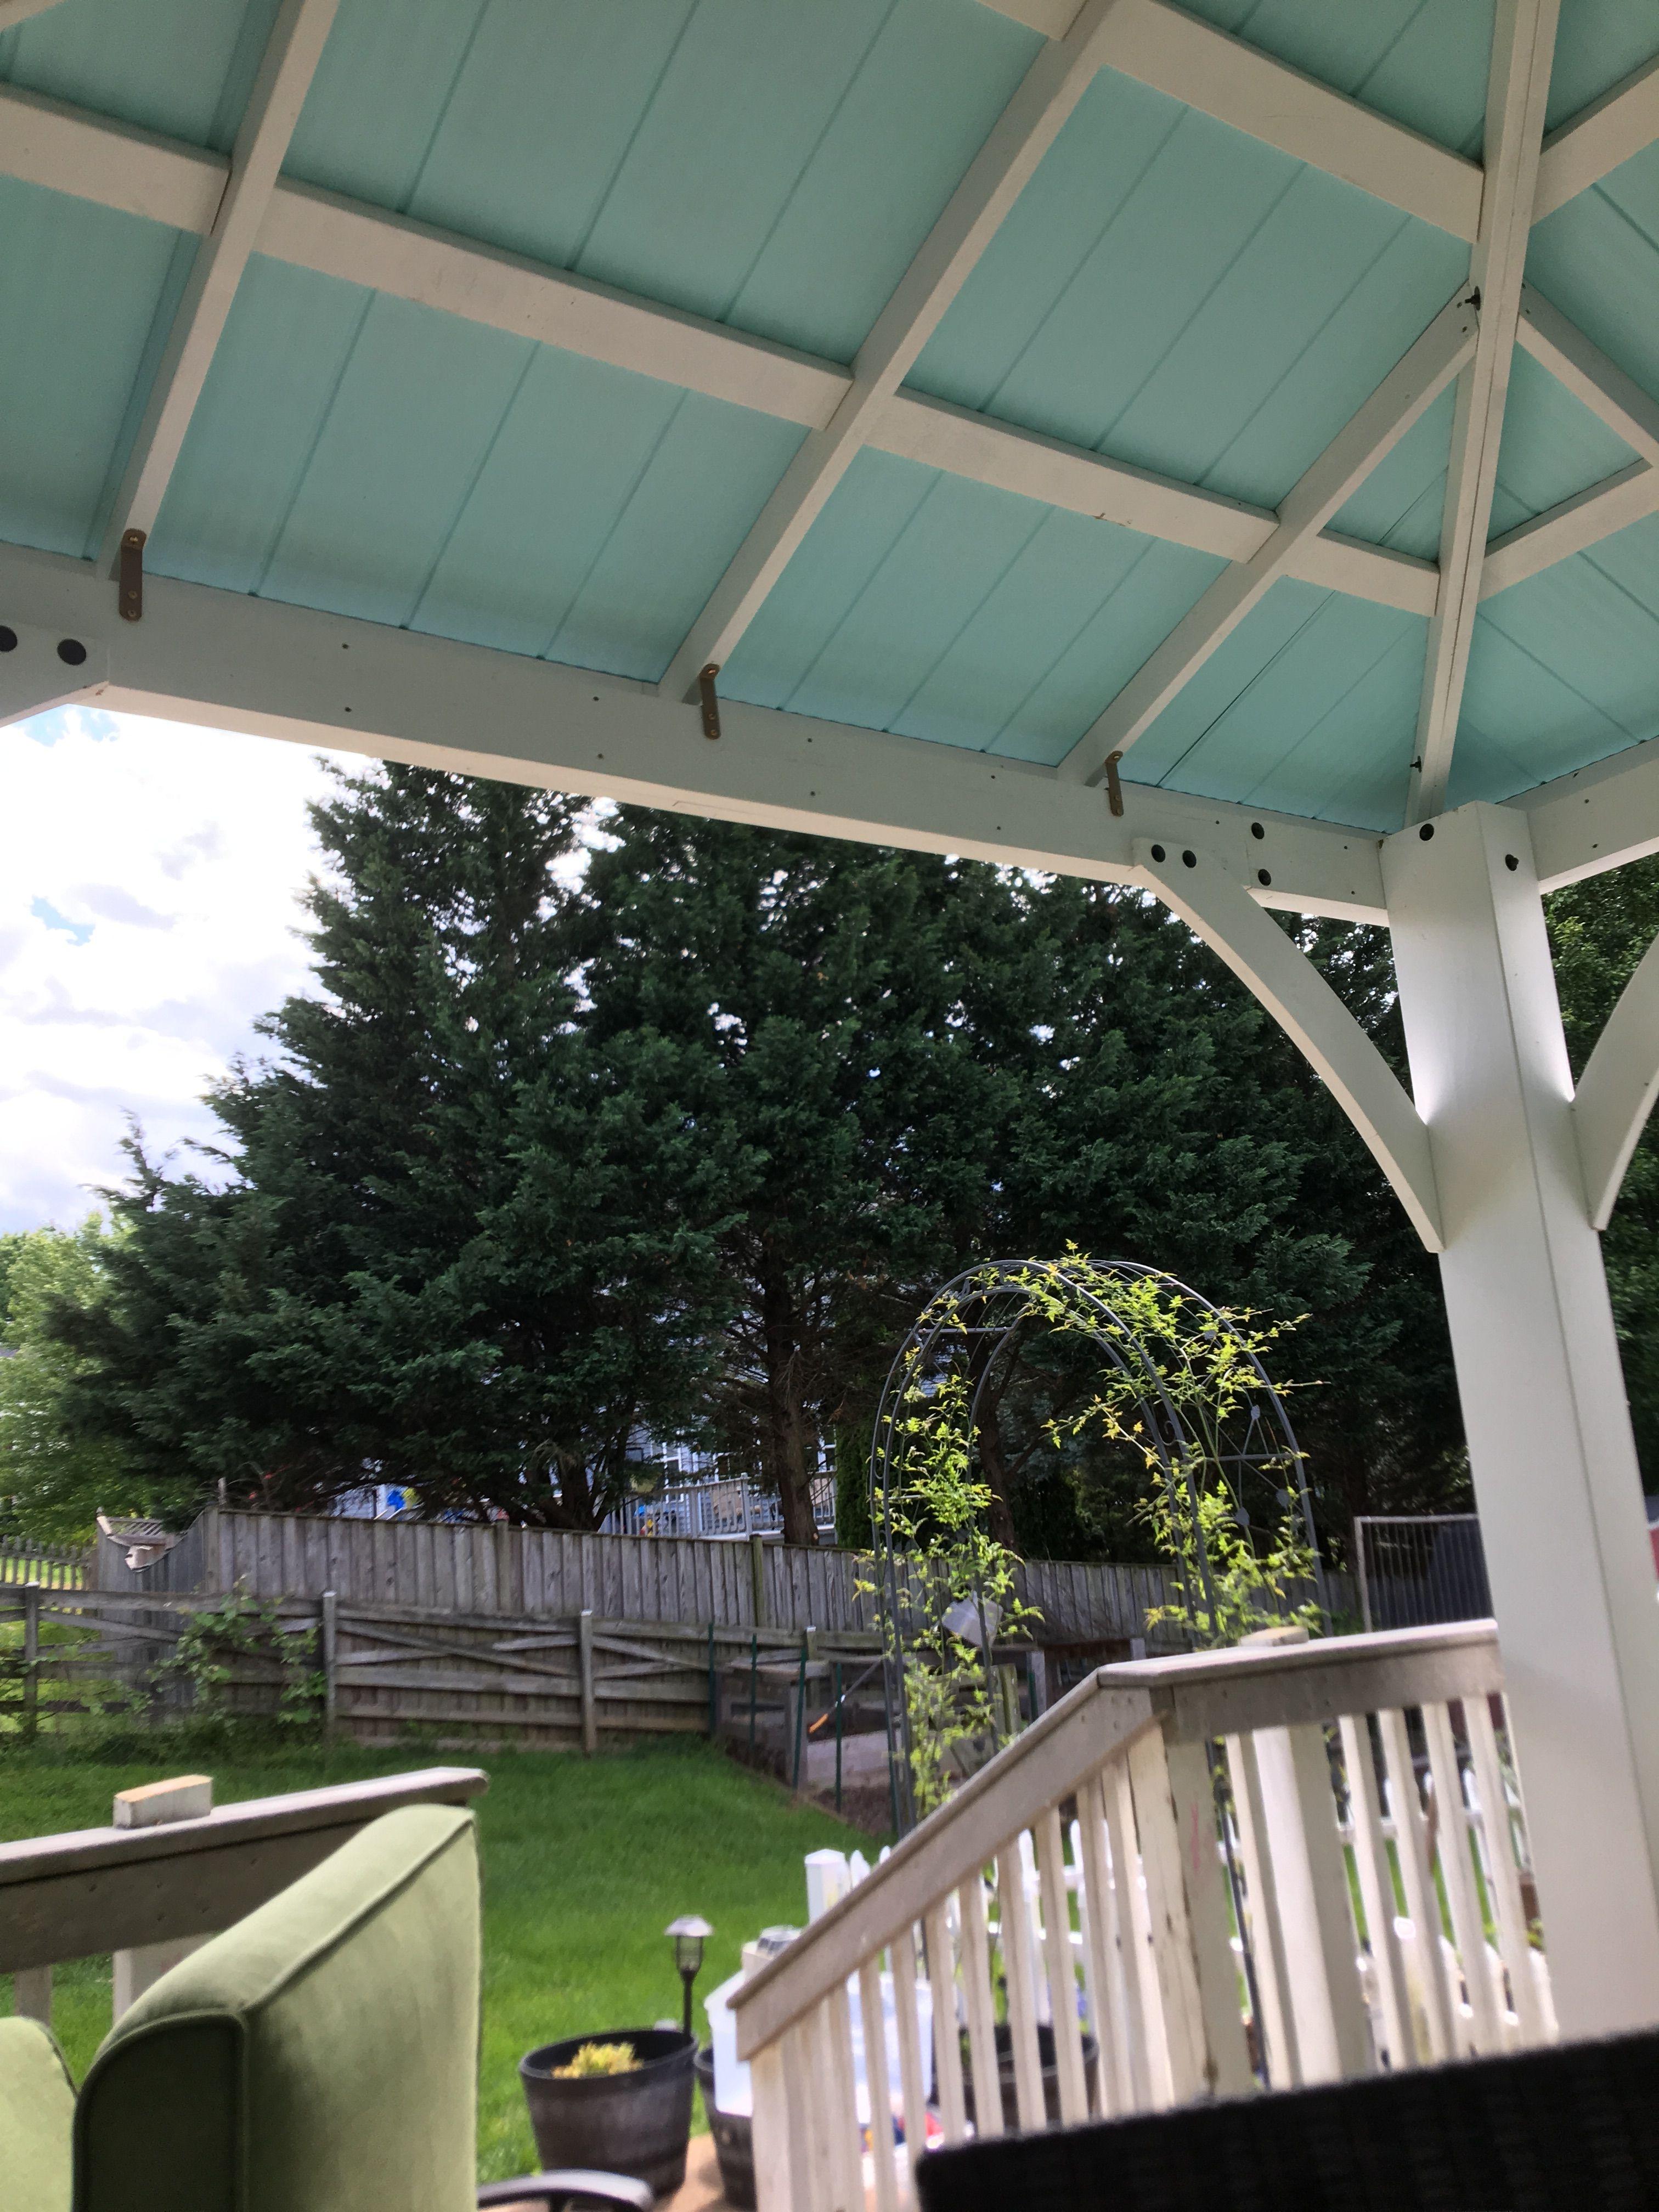 Painted The Costco Gazebo Costco Gazebo Pergola Garden Gazebo